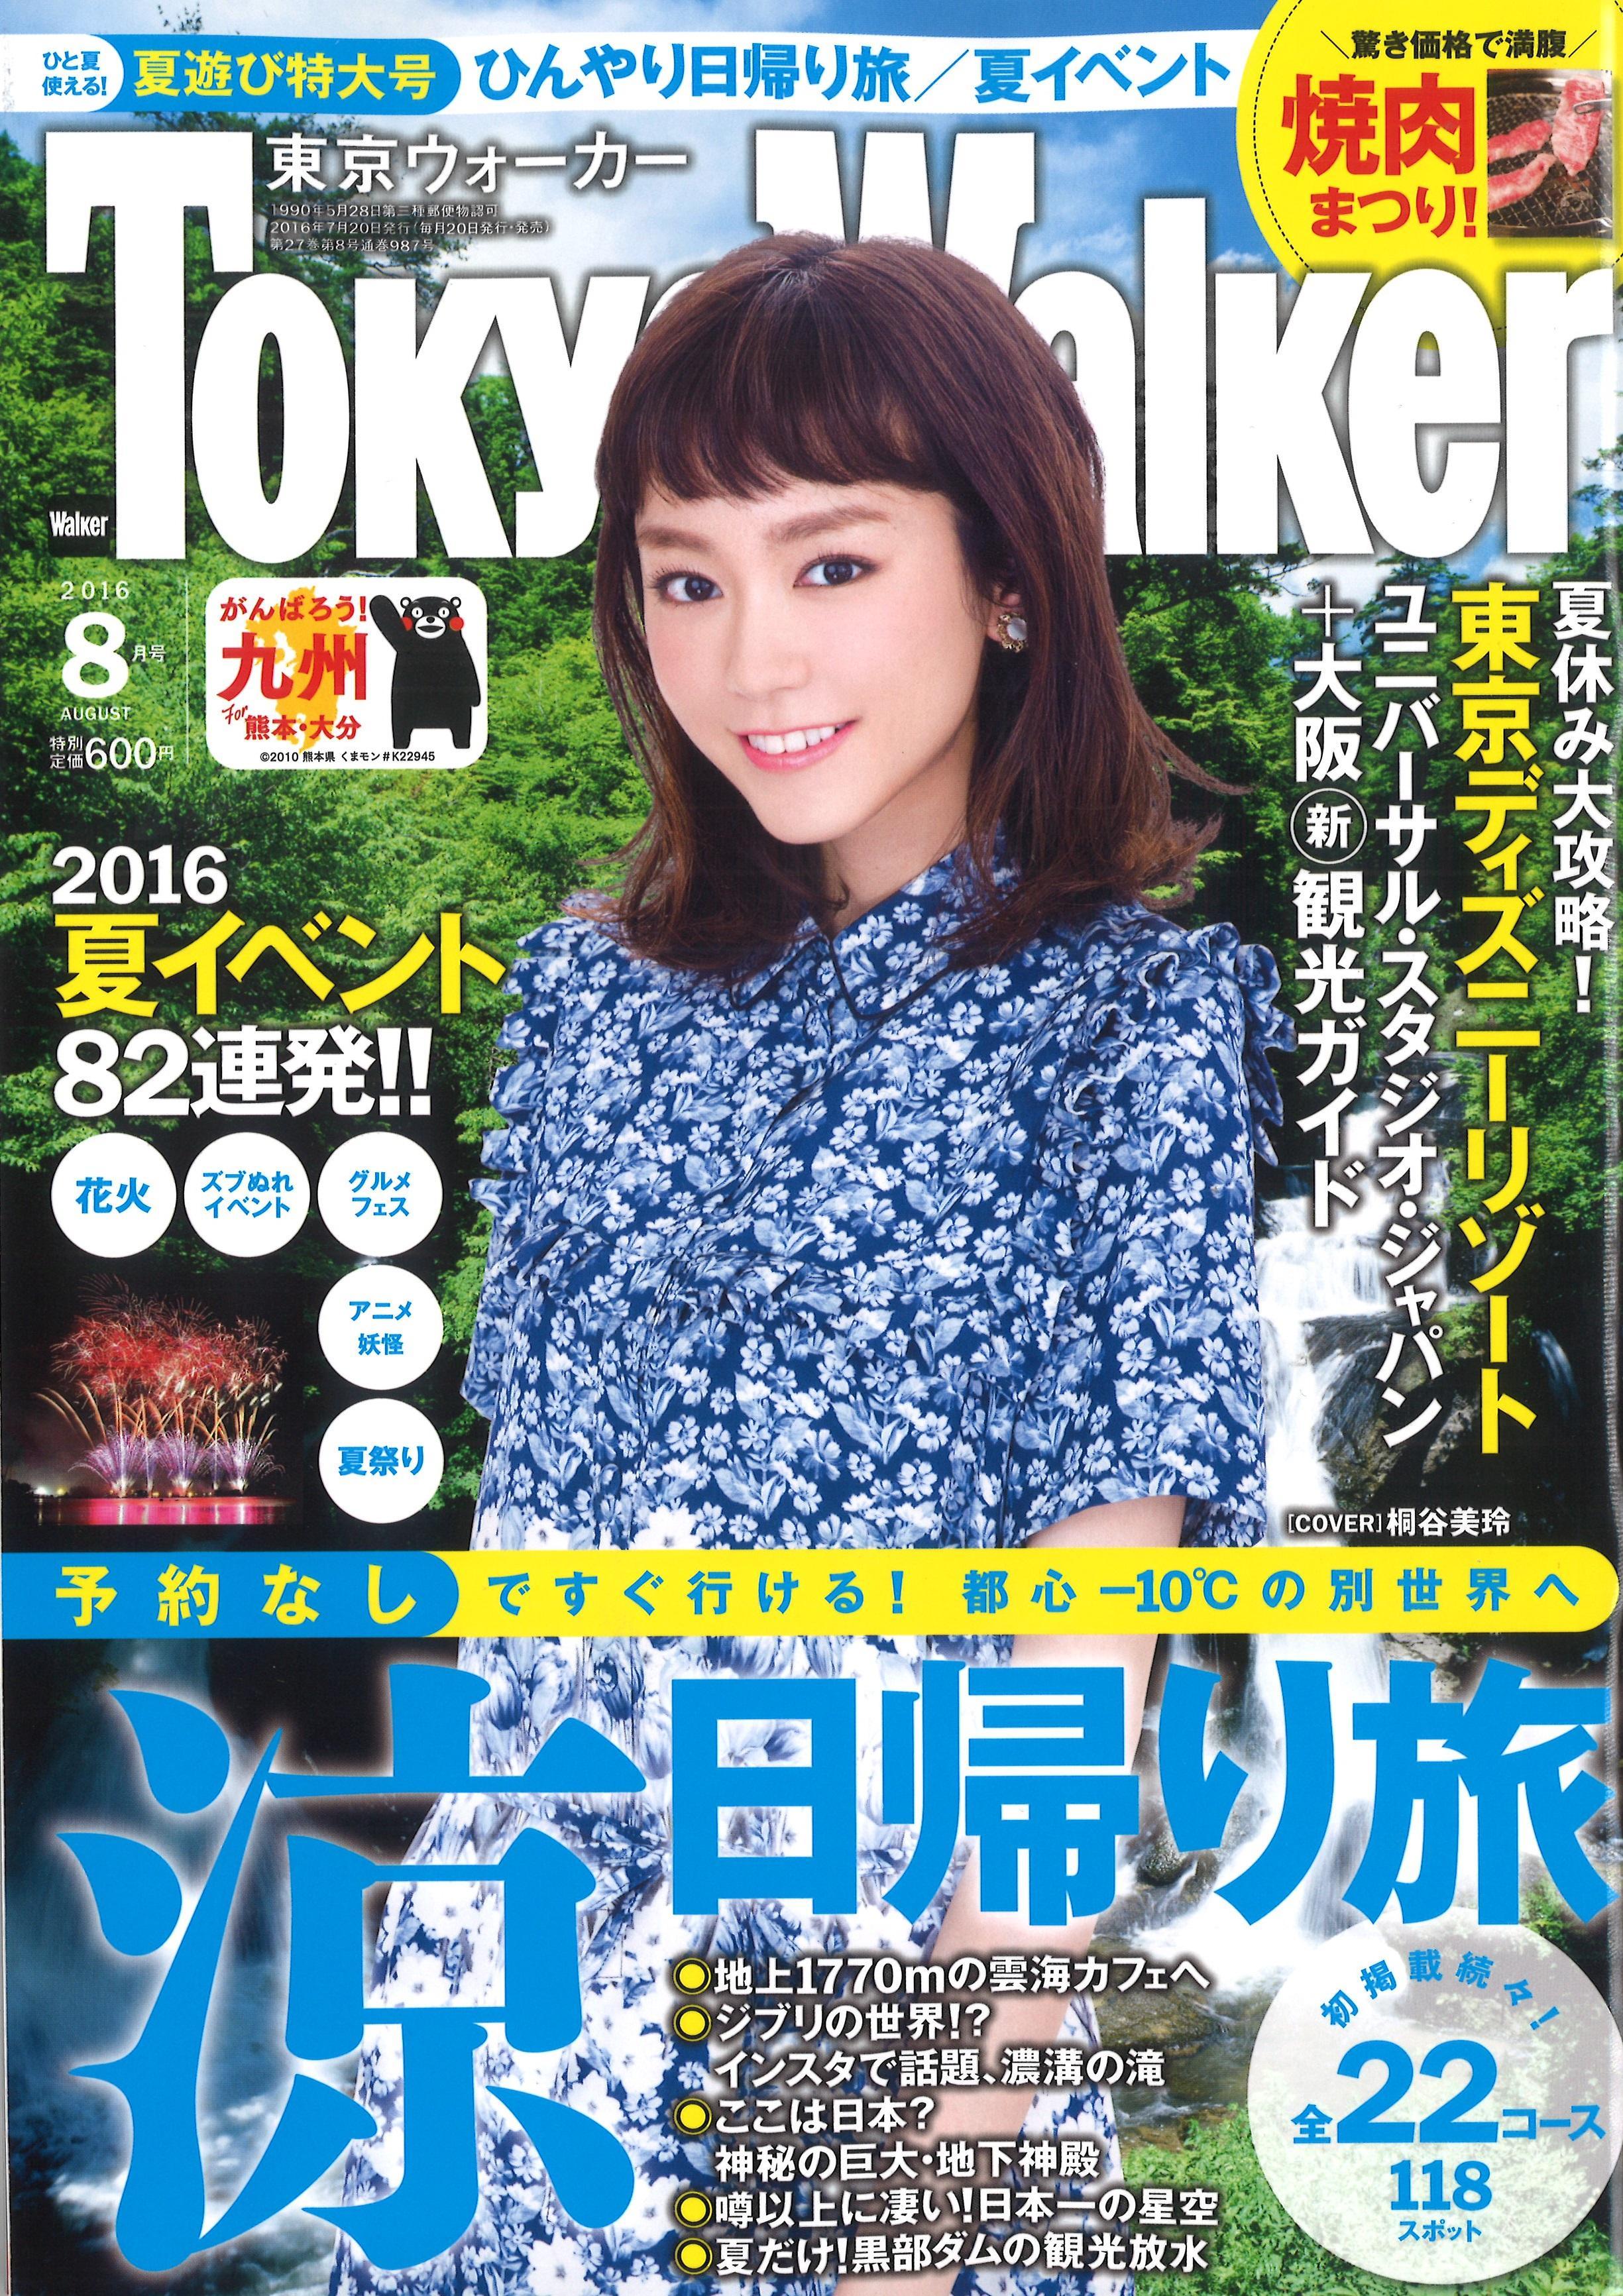 Tokyo Walker 8月号に掲載されました。